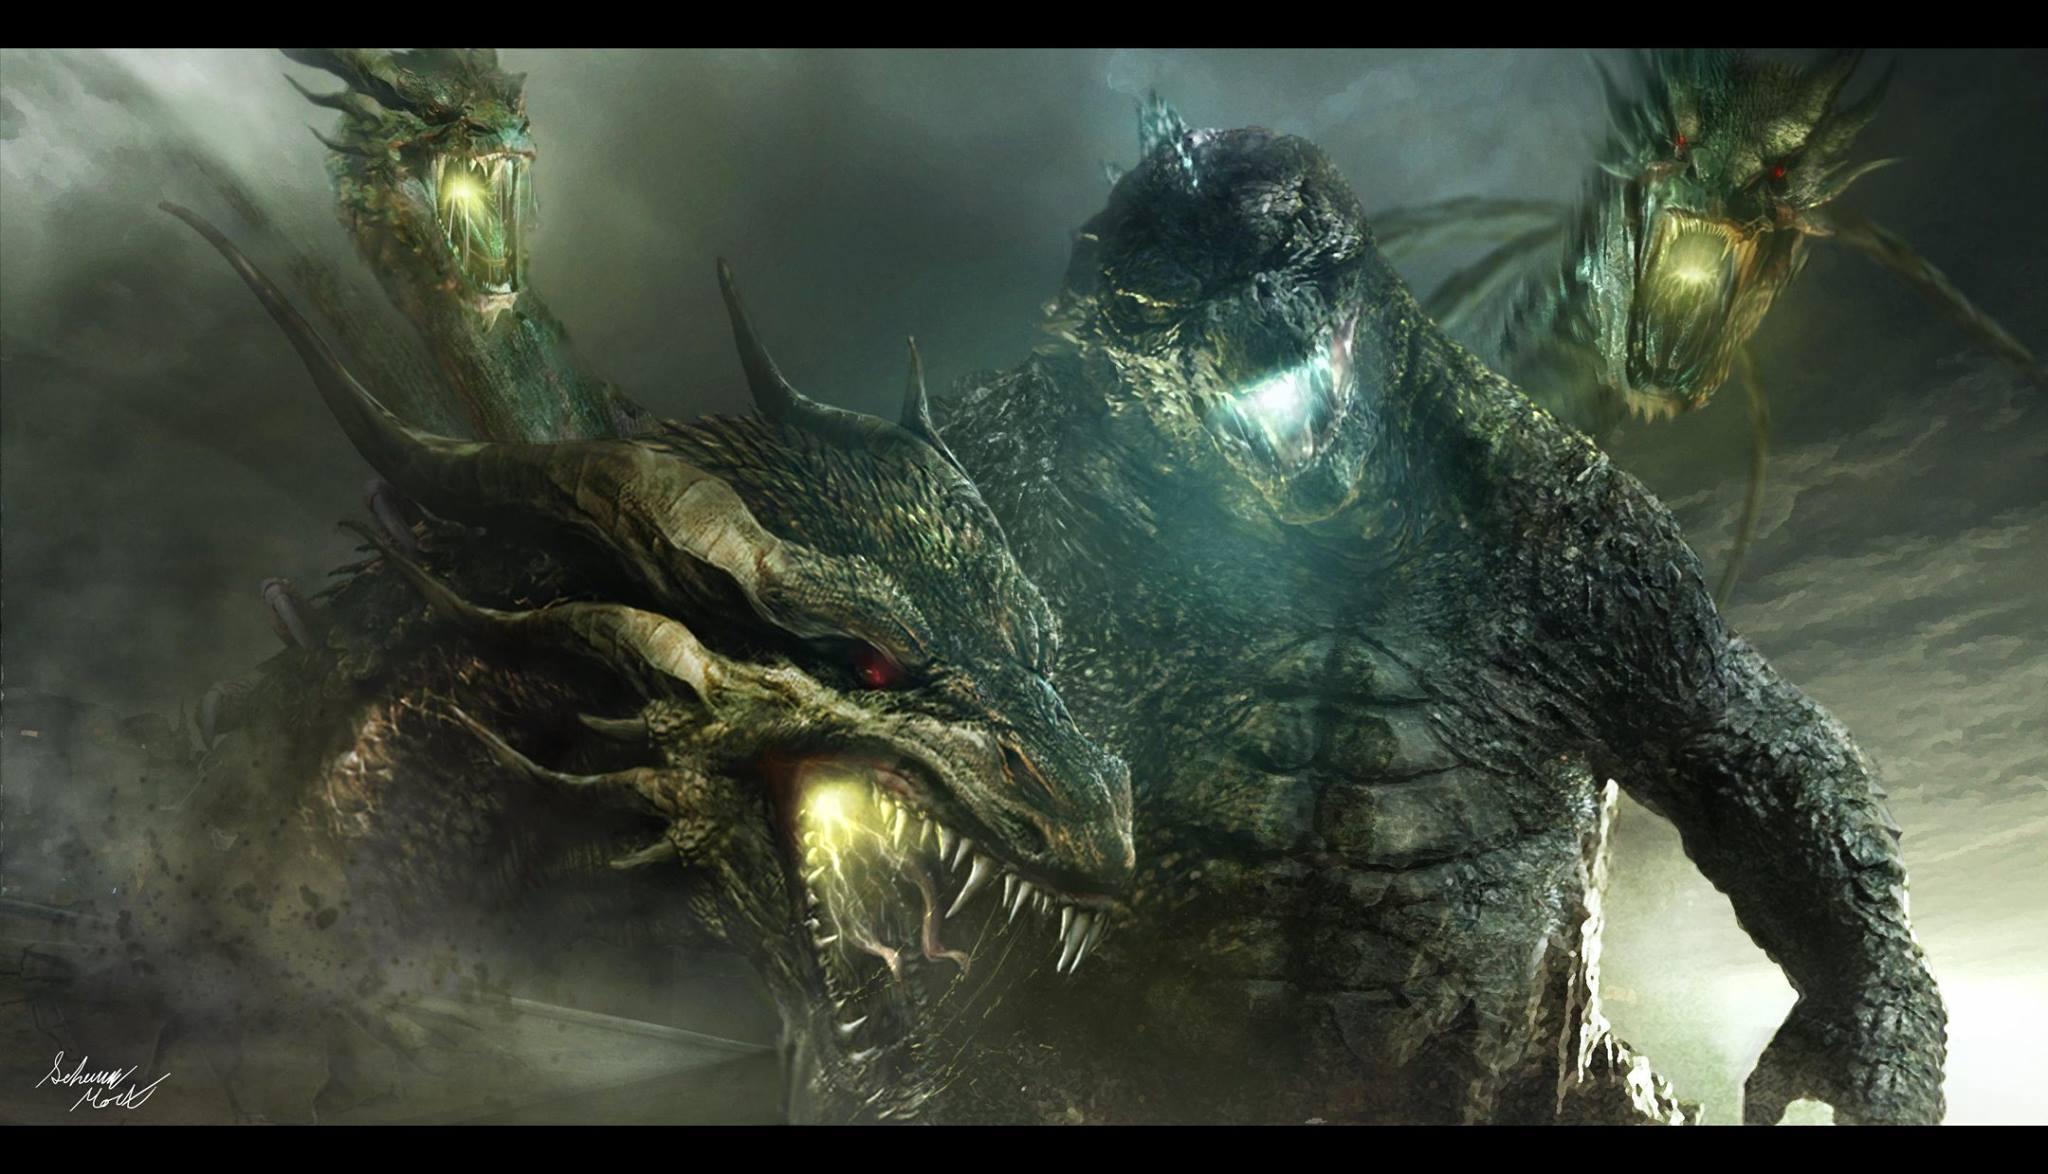 Godzilla Pics, Anime Collection